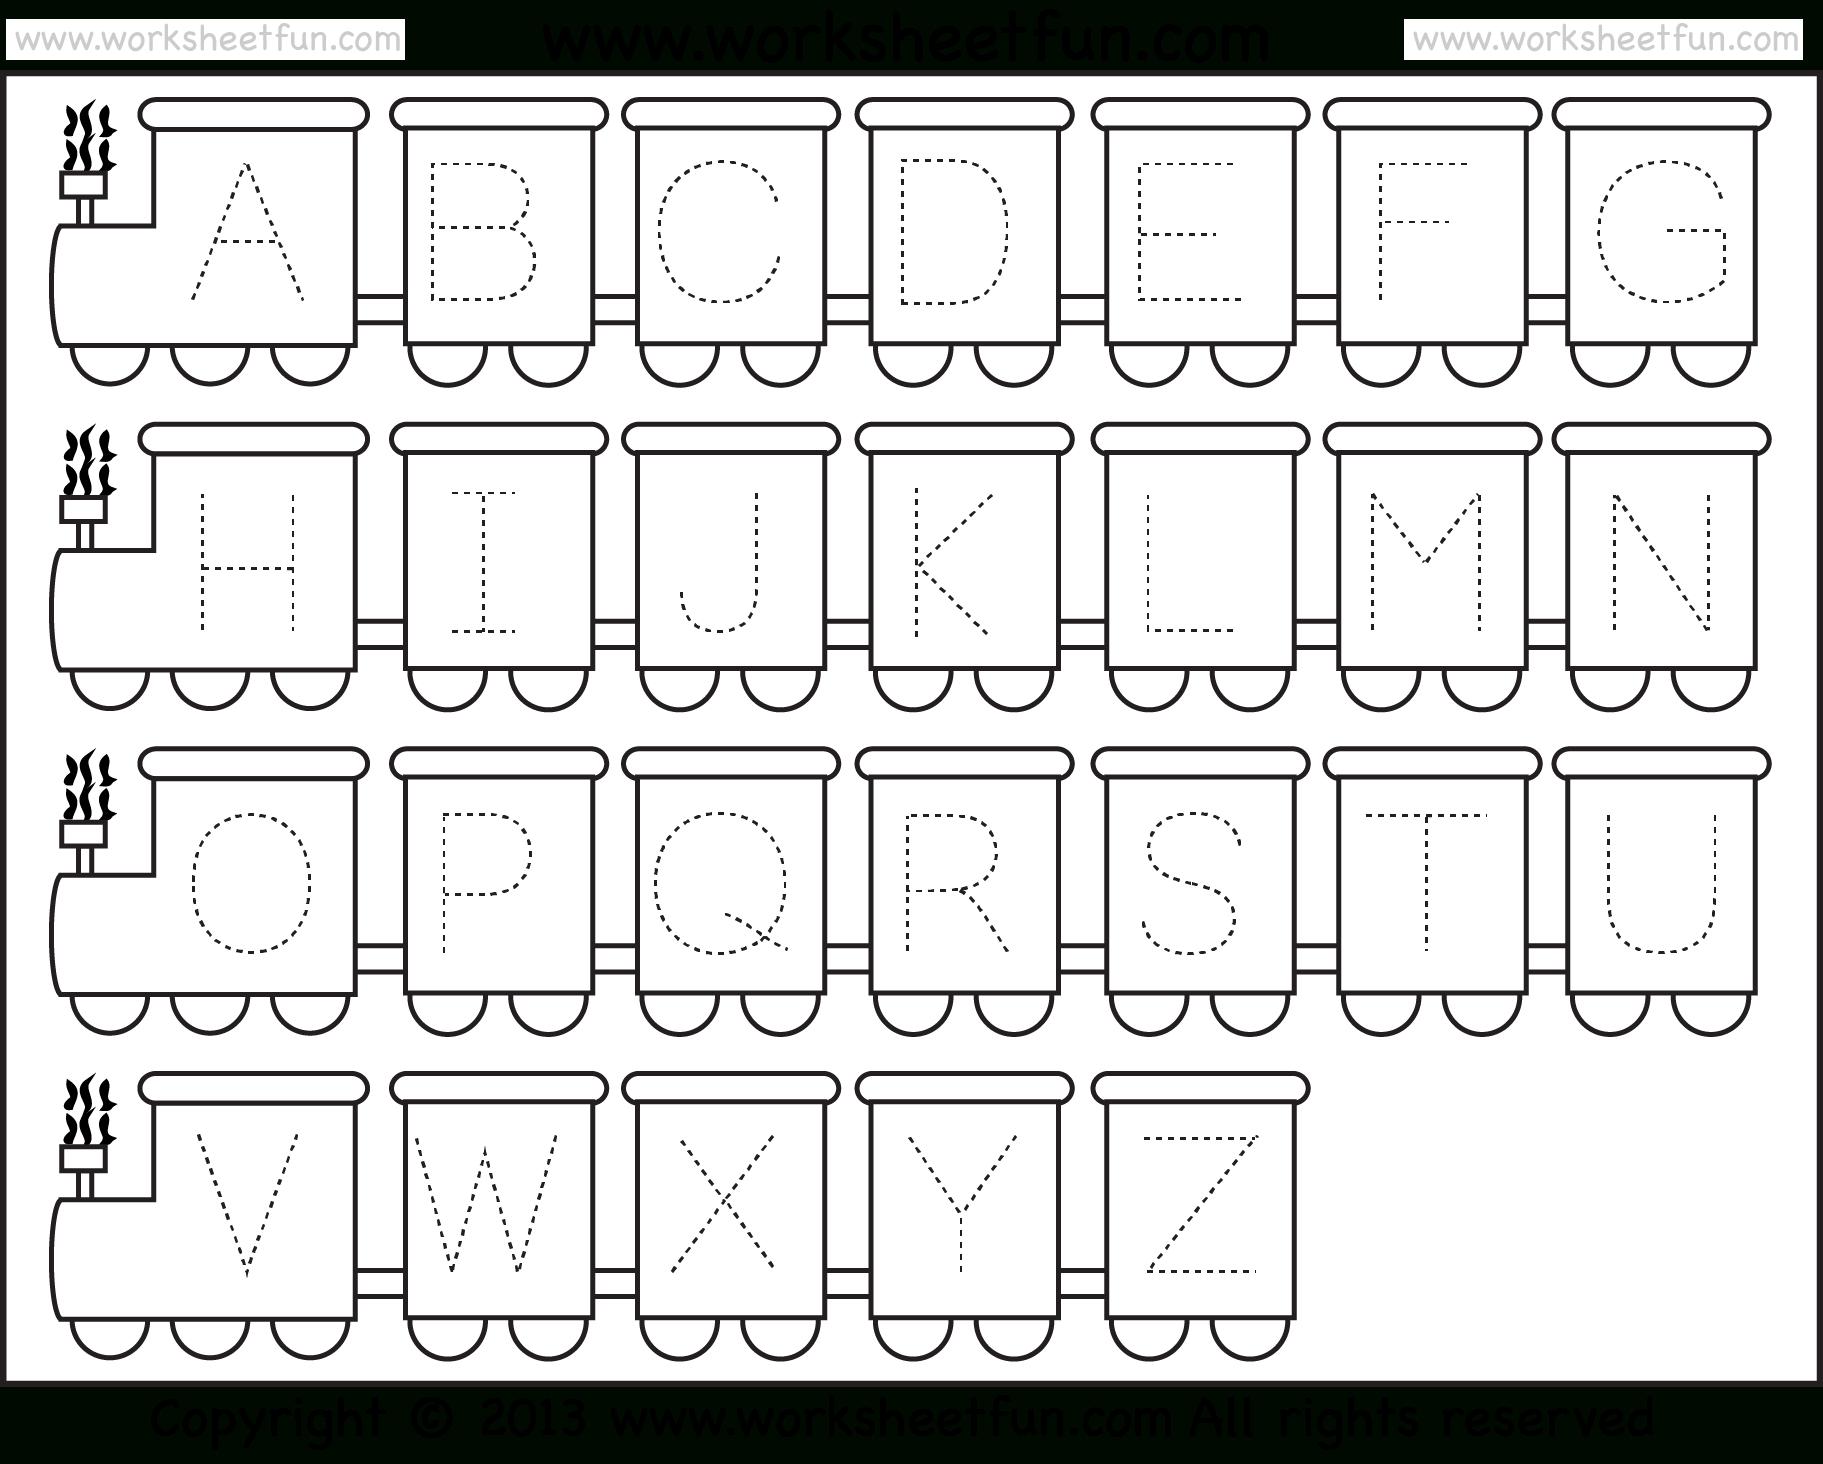 Letter Tracing Worksheet – Train Theme / Free Printable Worksheets - Free Printable Alphabet Tracing Worksheets For Kindergarten